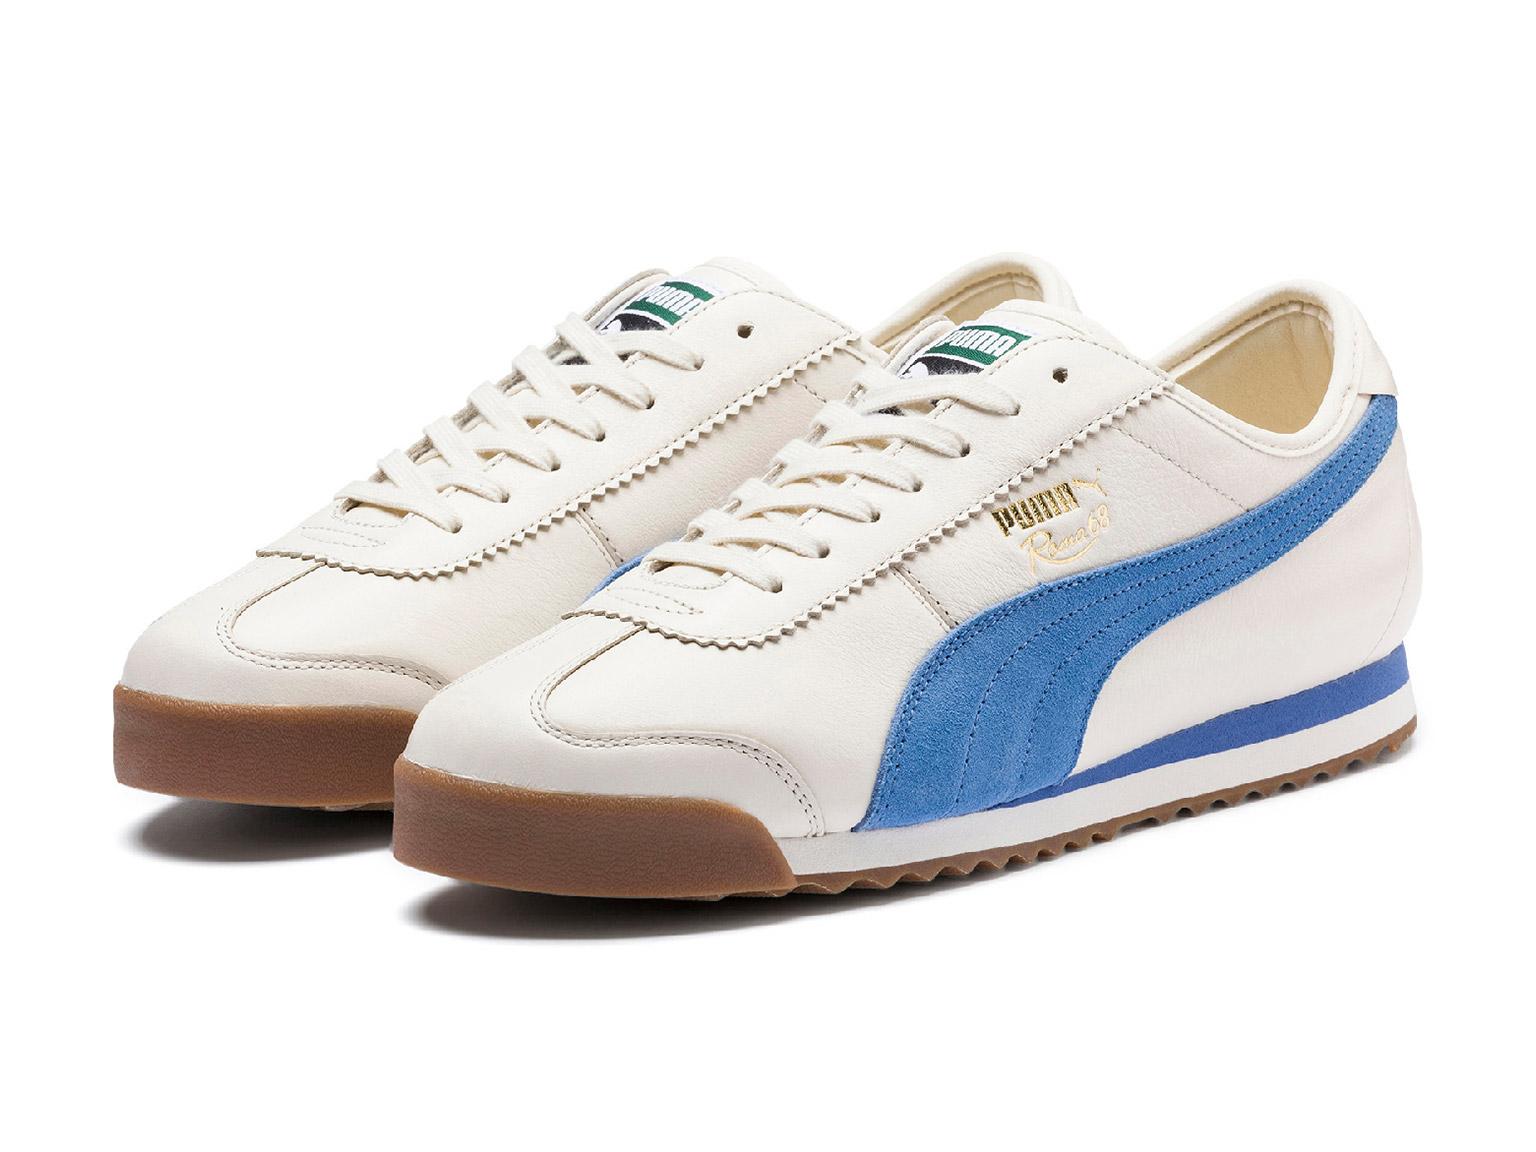 PUMA® - PUMA revives the heritage ROMA sneaker